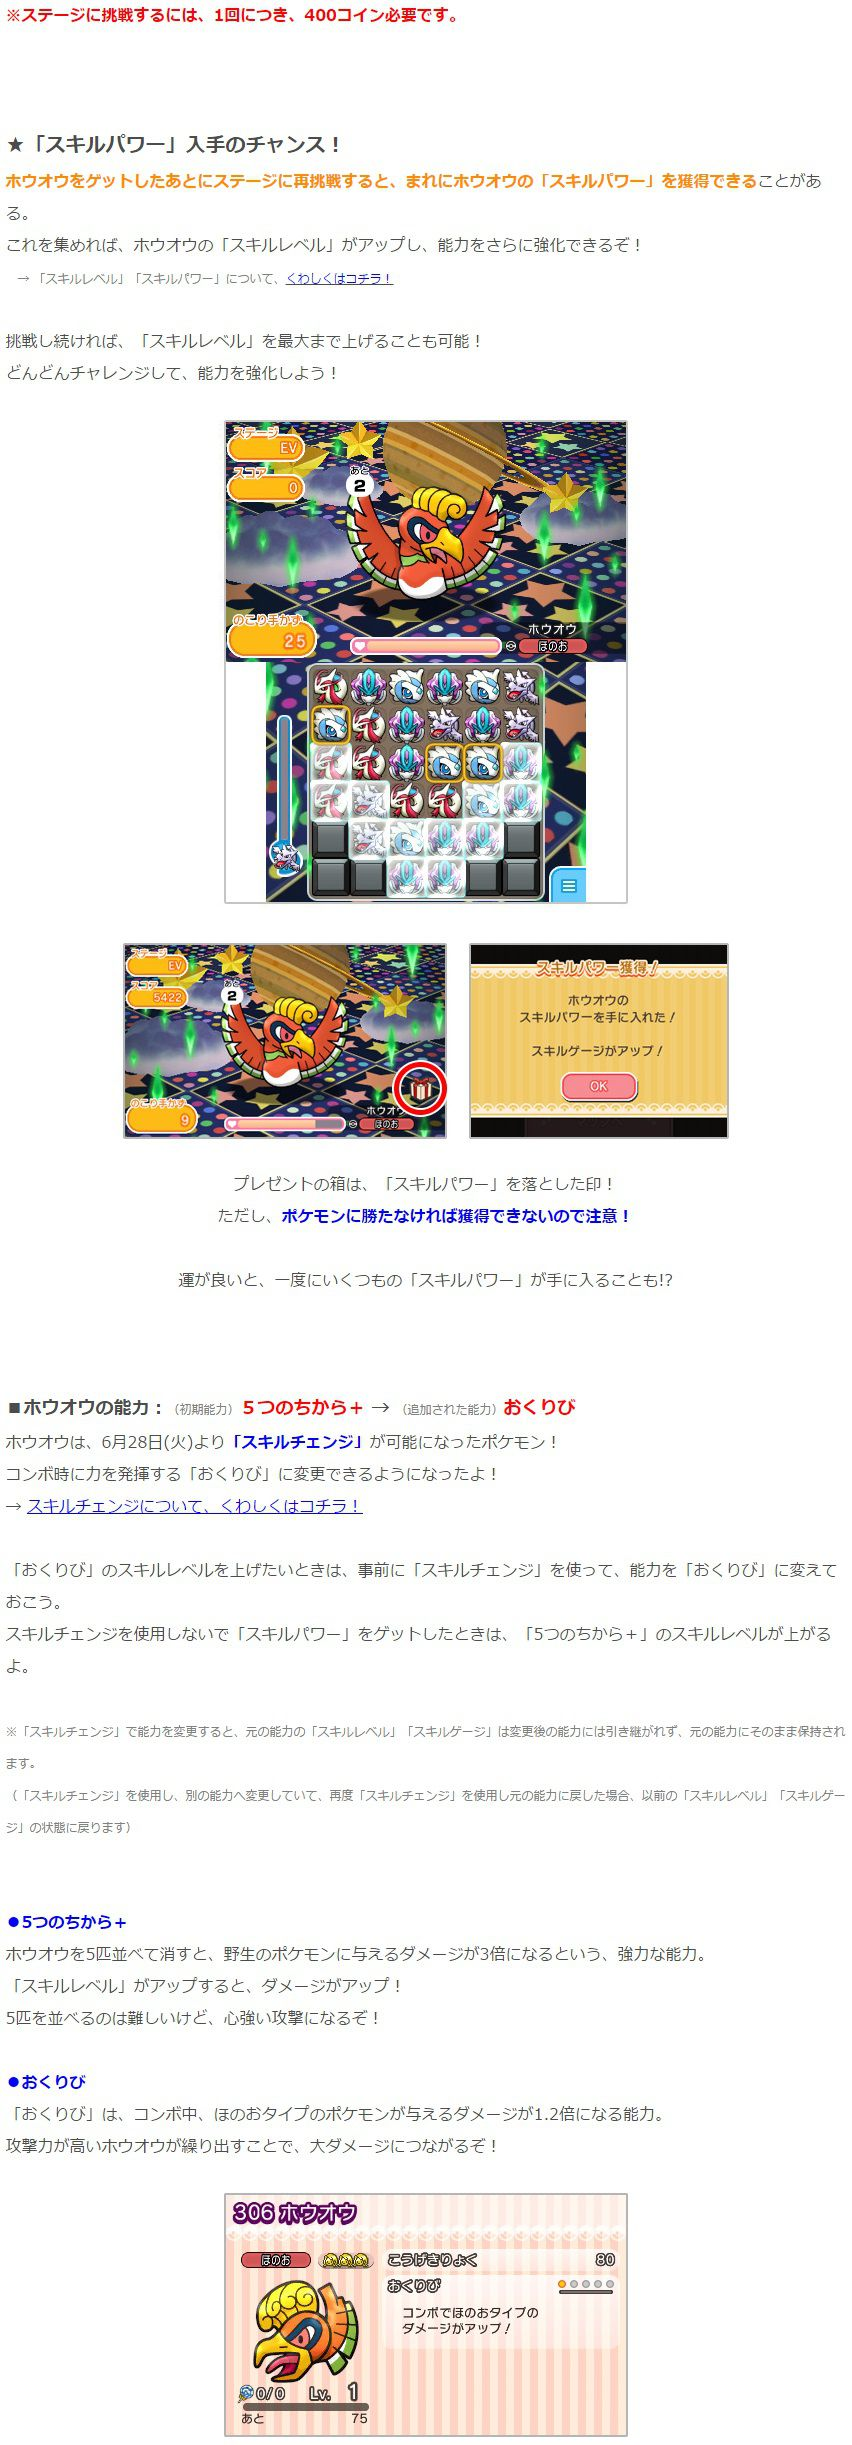 image_5838.jpg